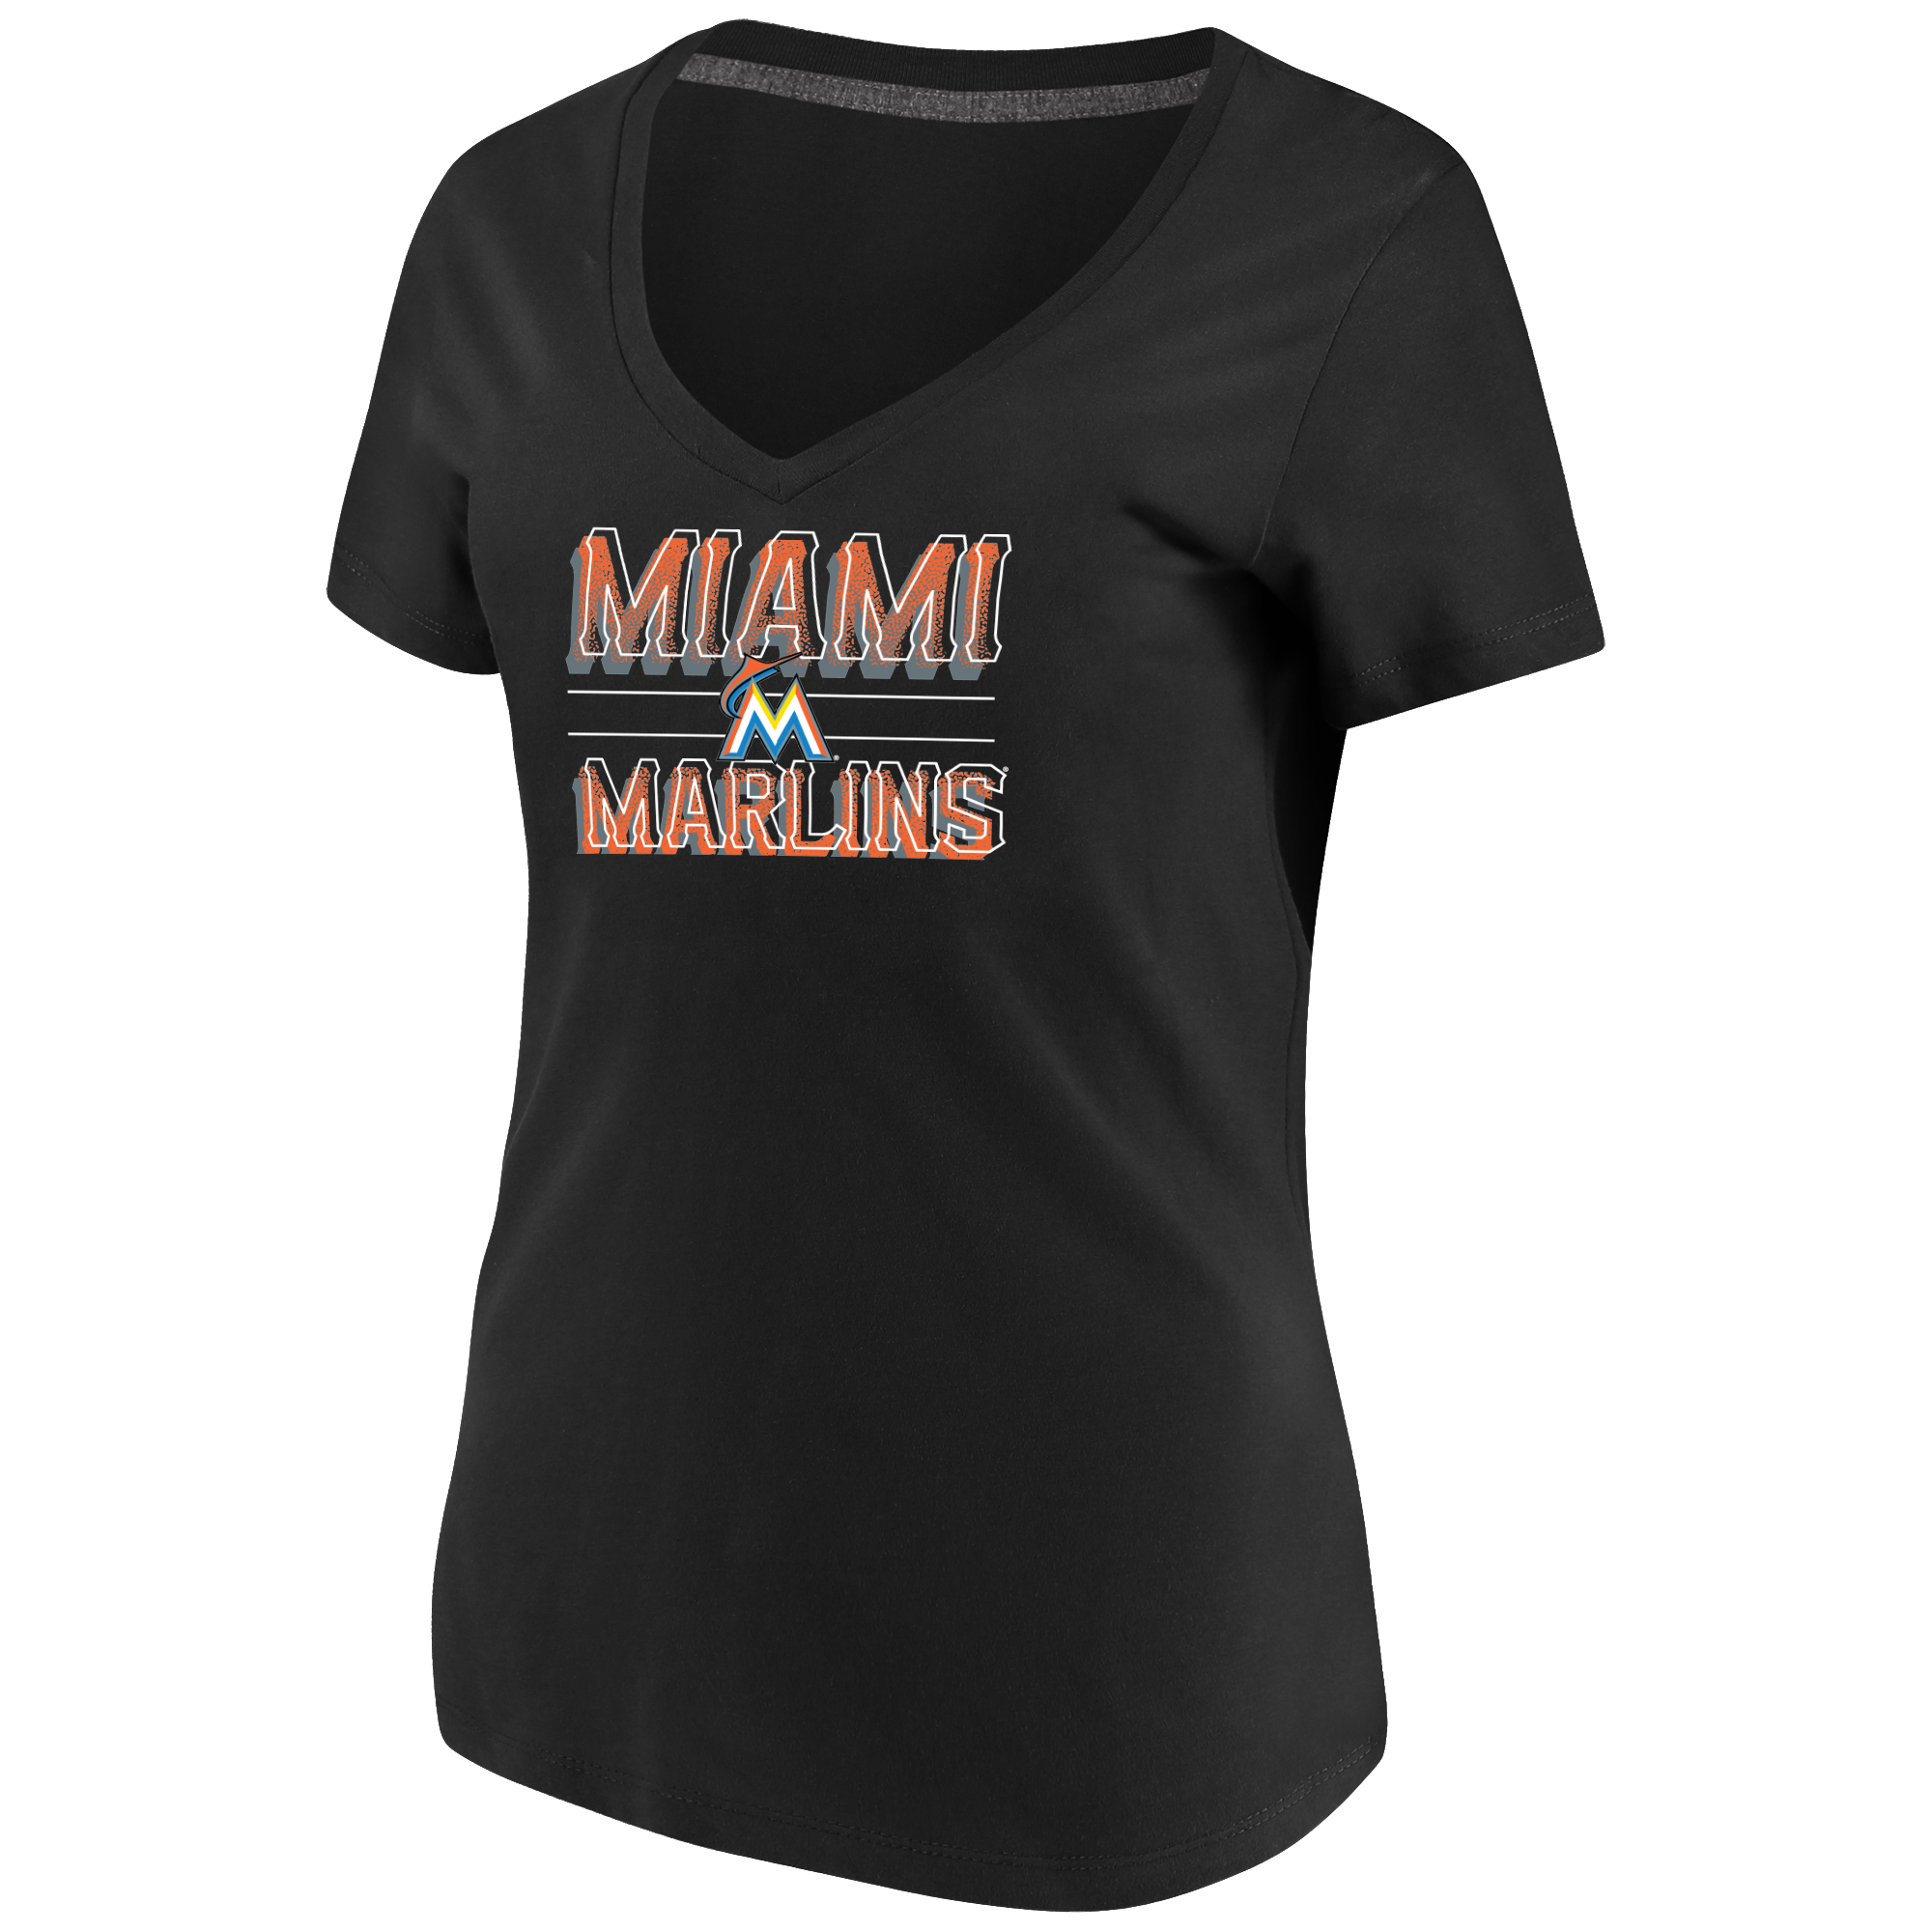 Women's Majestic Black Miami Marlins Compulsion to Win Plus Size V-Neck T-Shirt